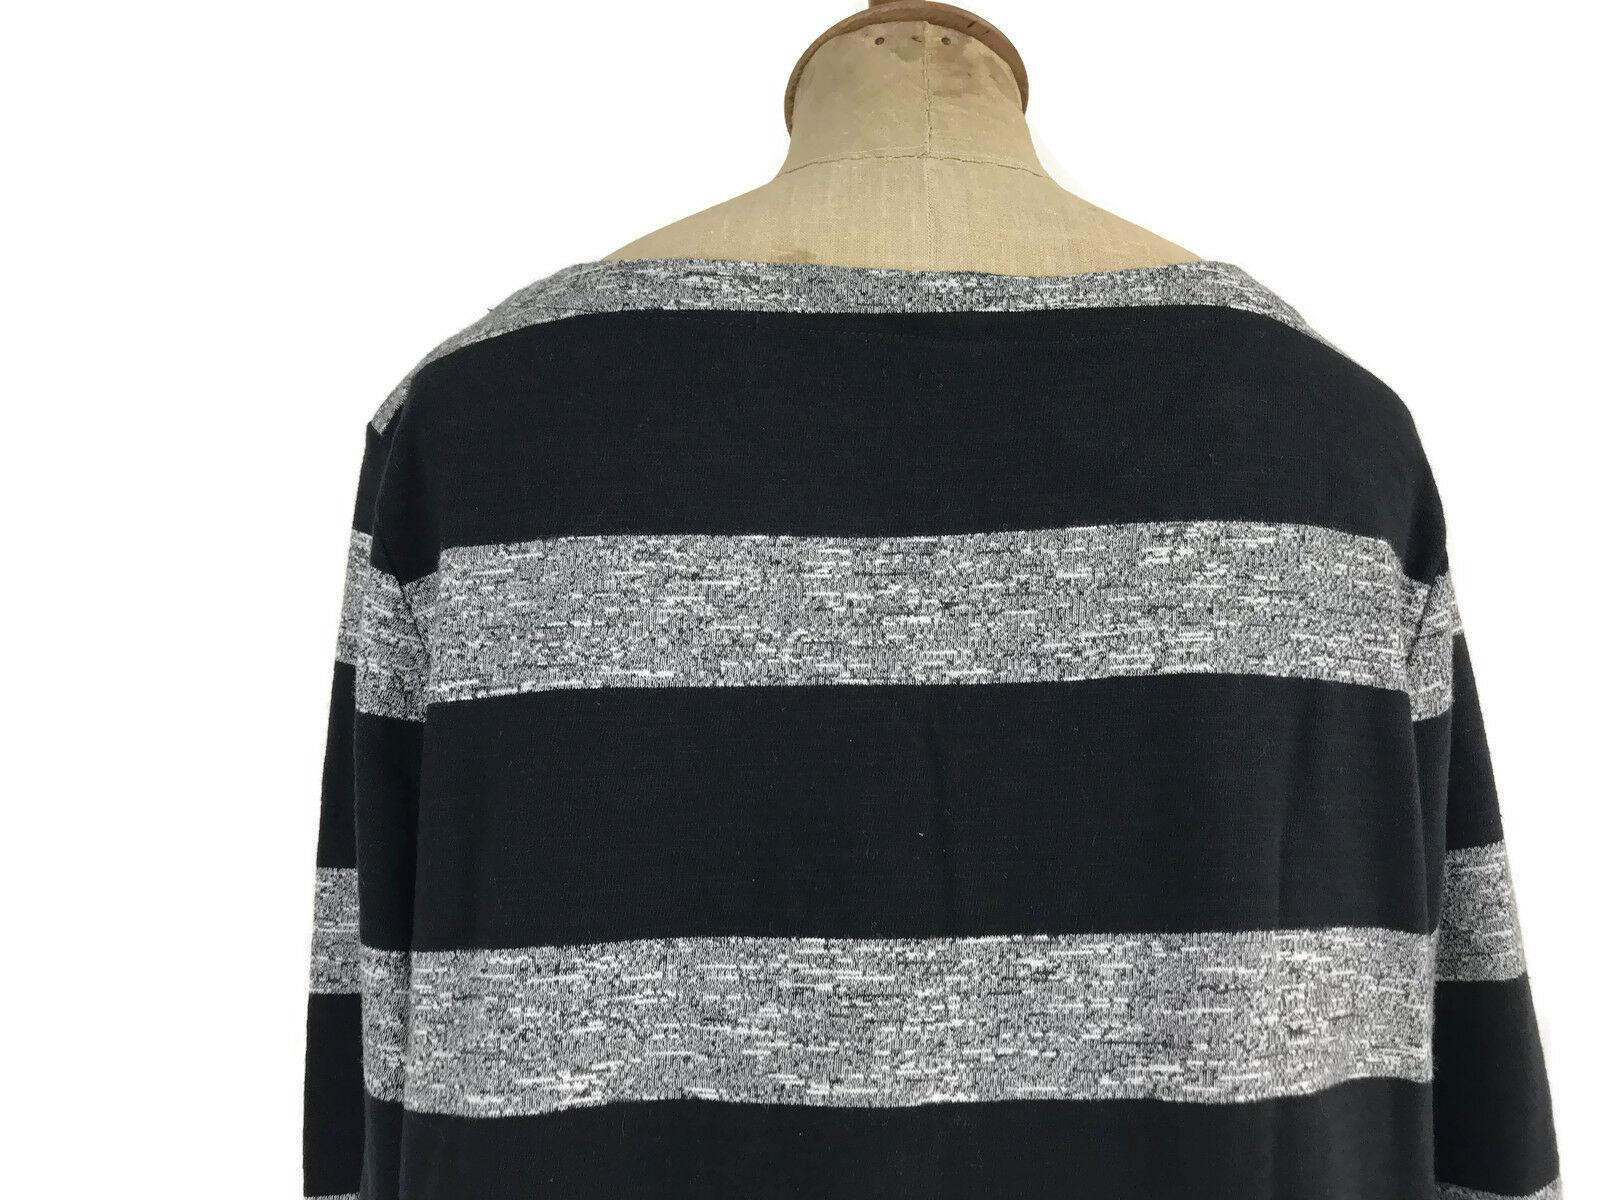 J. Crew Factory Dress Black Gray Stripe Boatneck 3/4 Sleeves Style 02665 Sz L U1 image 5